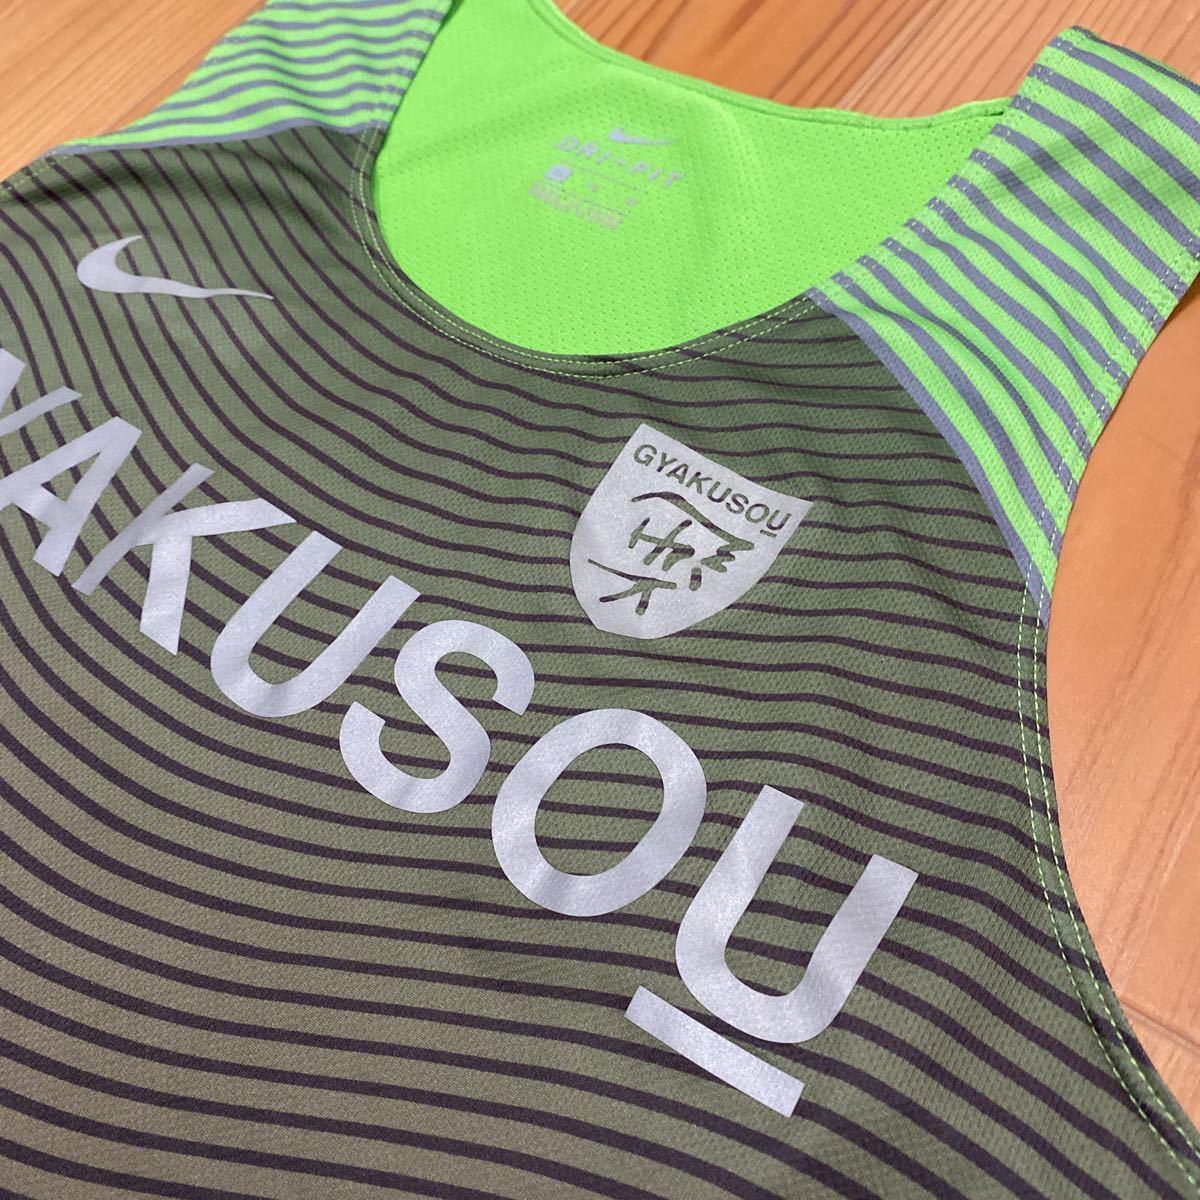 NIKE GYAKUSOU ディスタンスシングレット XL/ ナイキ マラソン ランニングウェア タンクトップ Tシャツ undercover コラボ 別注